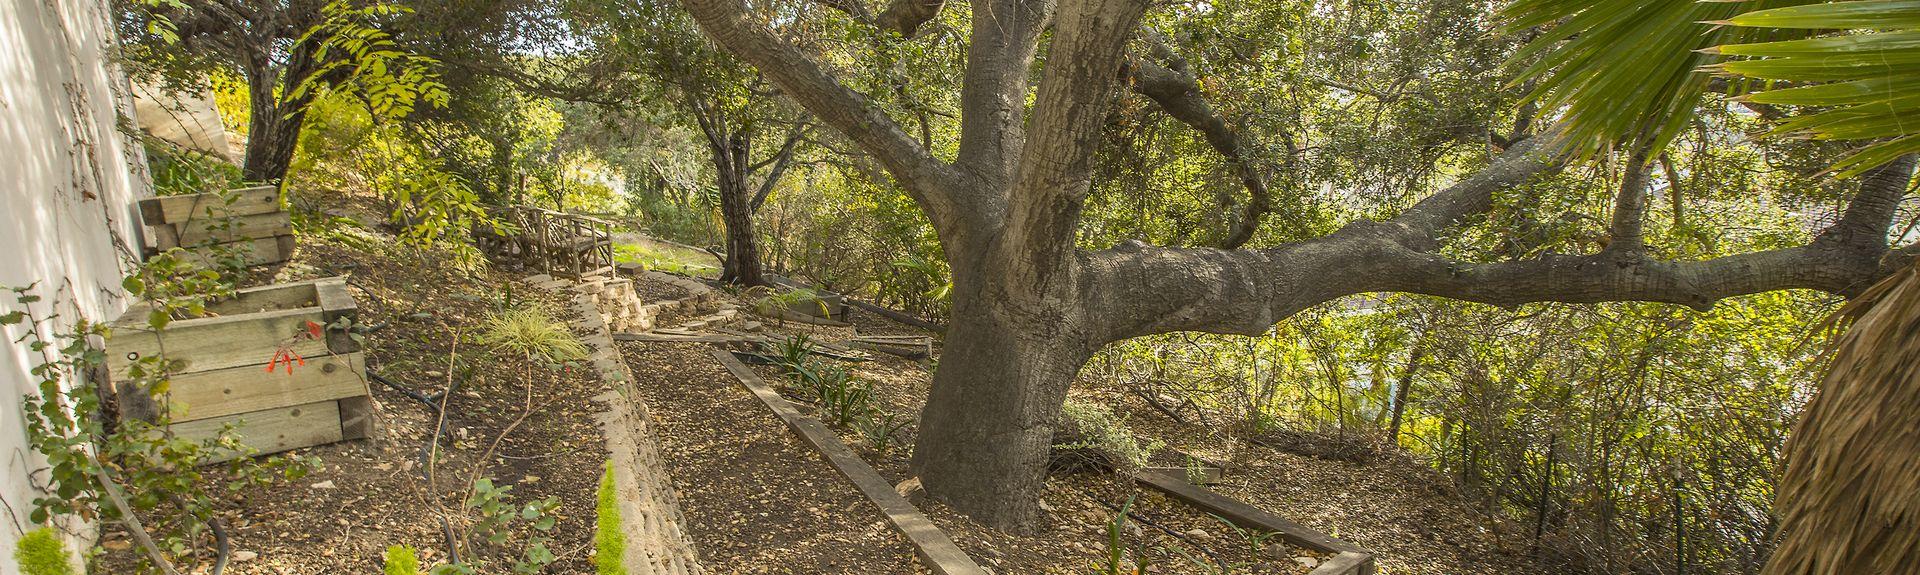 Upper East, Santa Barbara, Kalifornien, Vereinigte Staaten